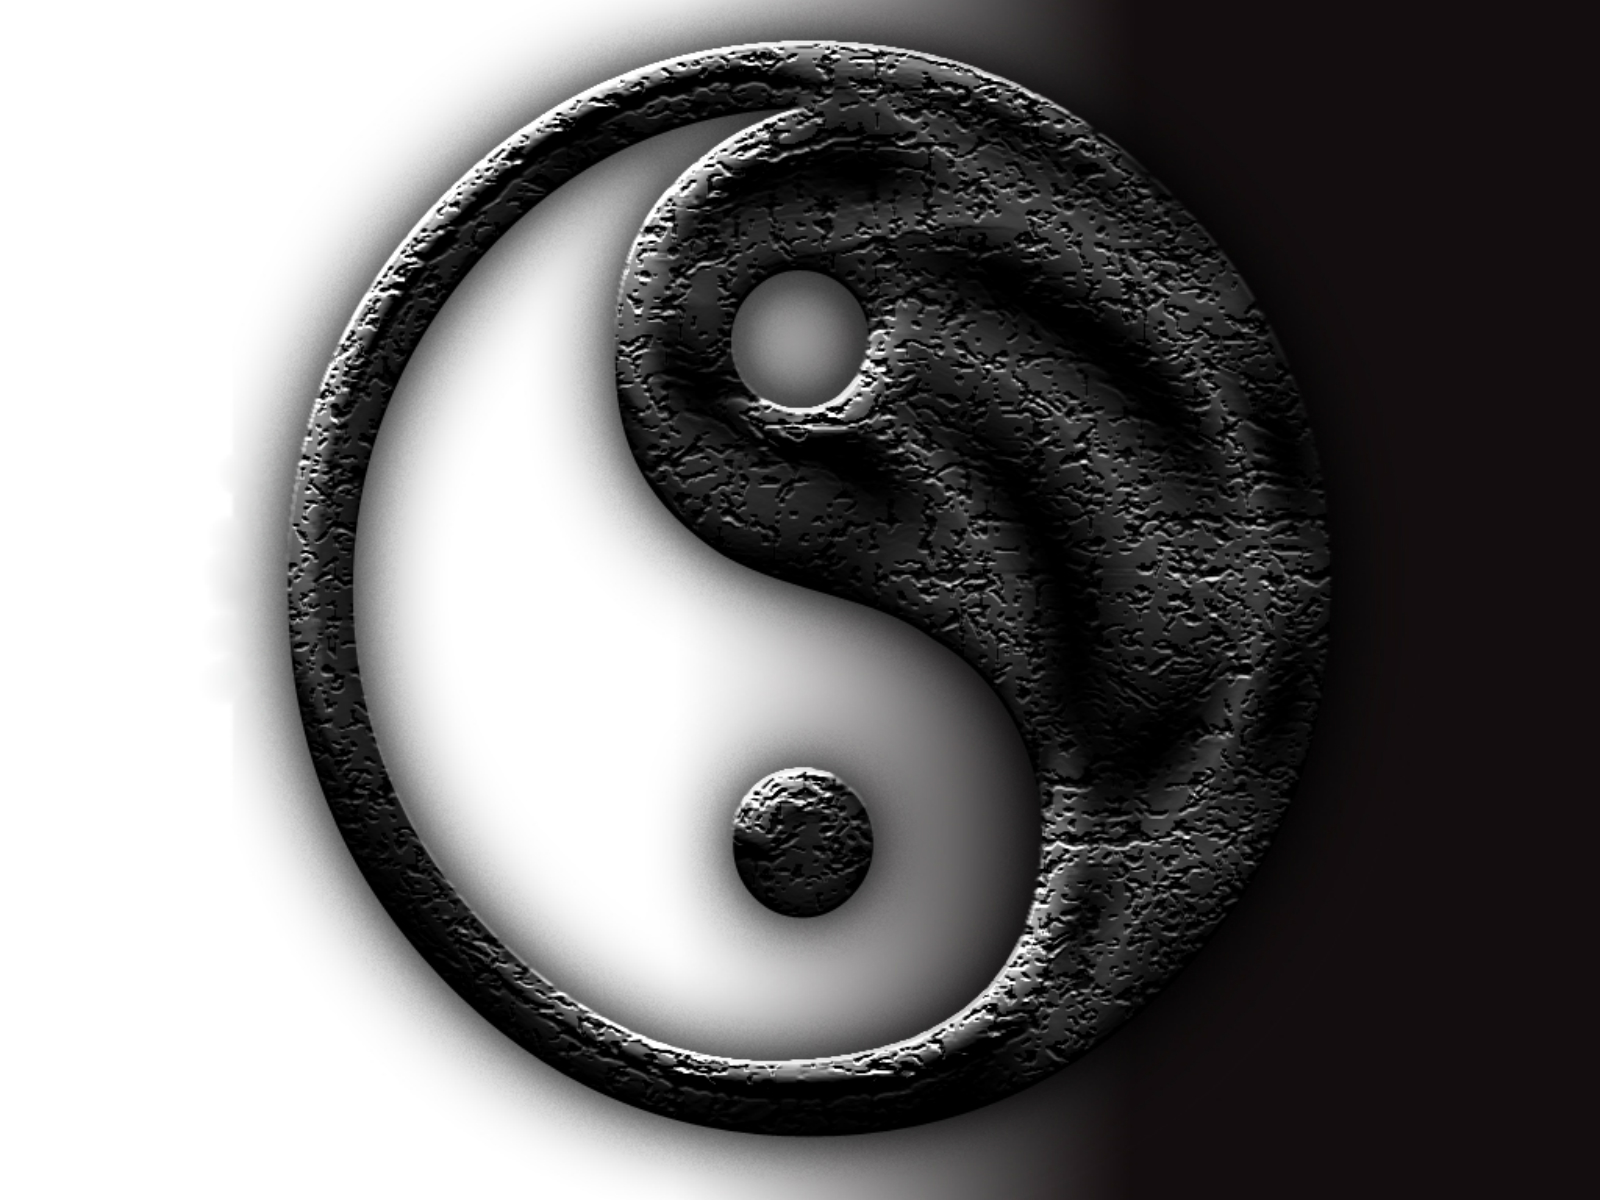 http://2.bp.blogspot.com/-shLvc4Vvwek/Tlb8q-hFllI/AAAAAAAAAp8/MRpsmNFDYz8/s1600/www.Vvallpaper.net_ying_yang_sensei_3d_highf_definition_ekinoks_love.jpg